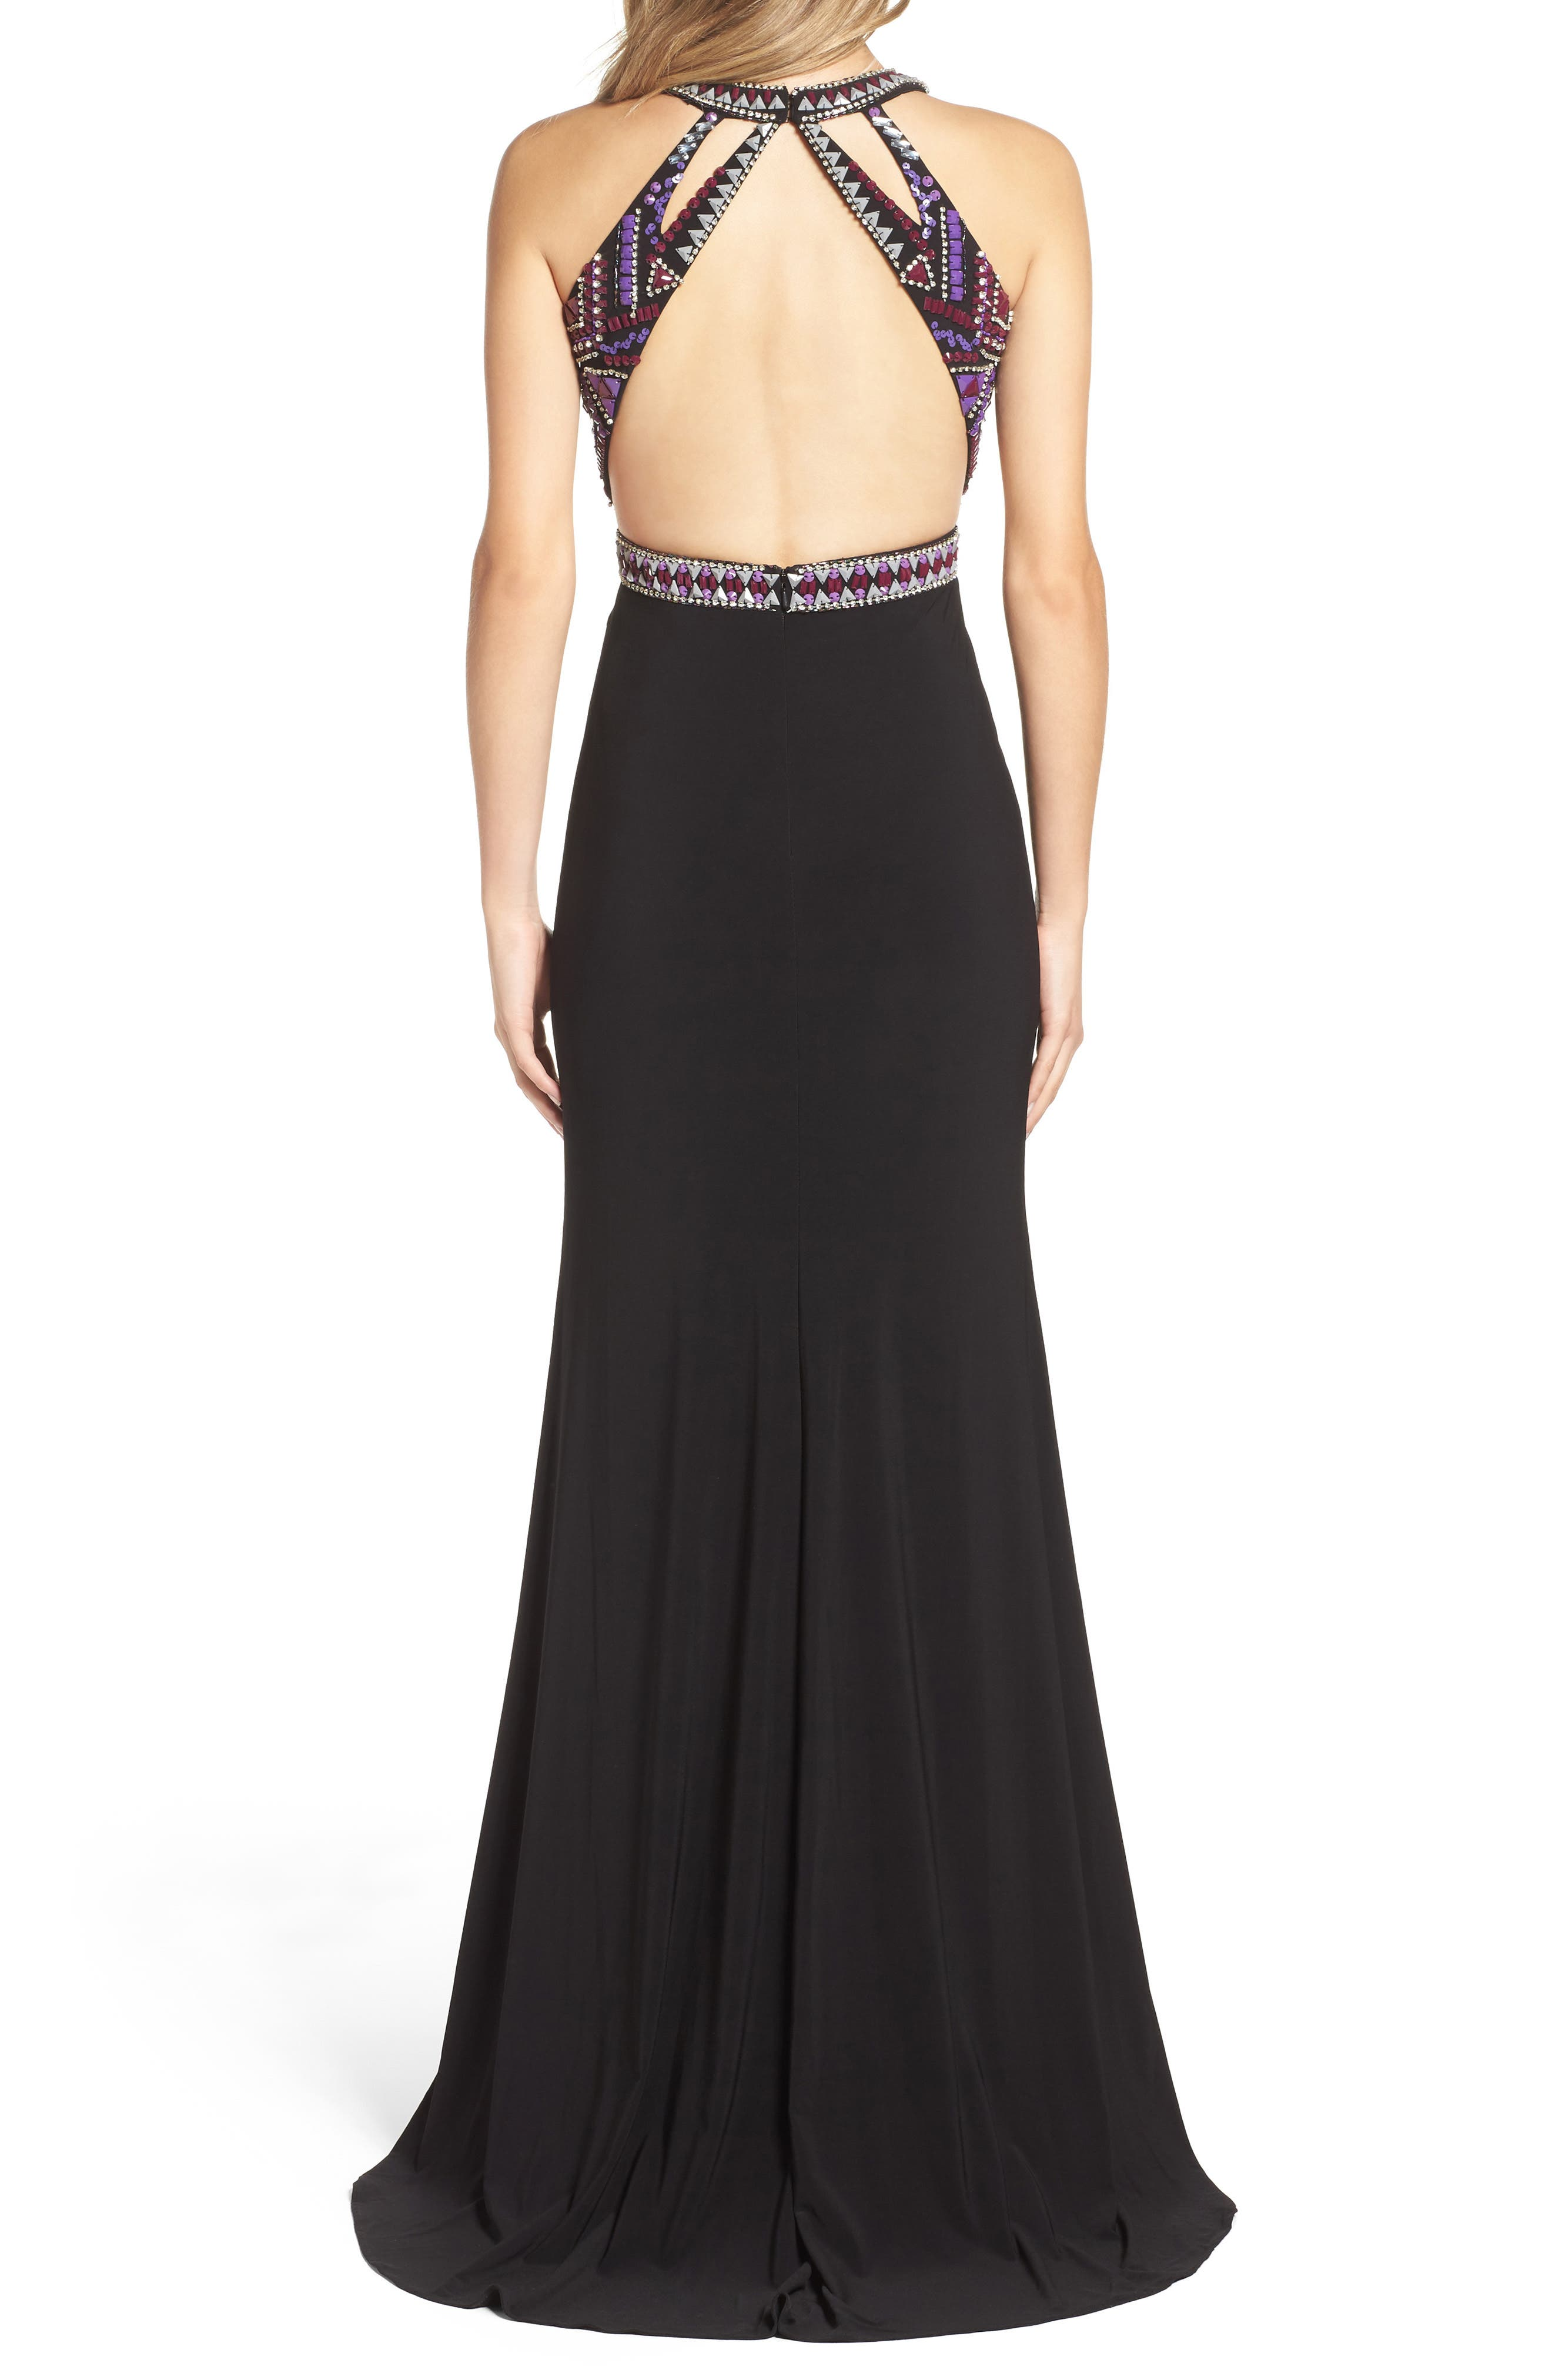 Embellished Jersey Gown,                             Alternate thumbnail 2, color,                             Black/ Multi